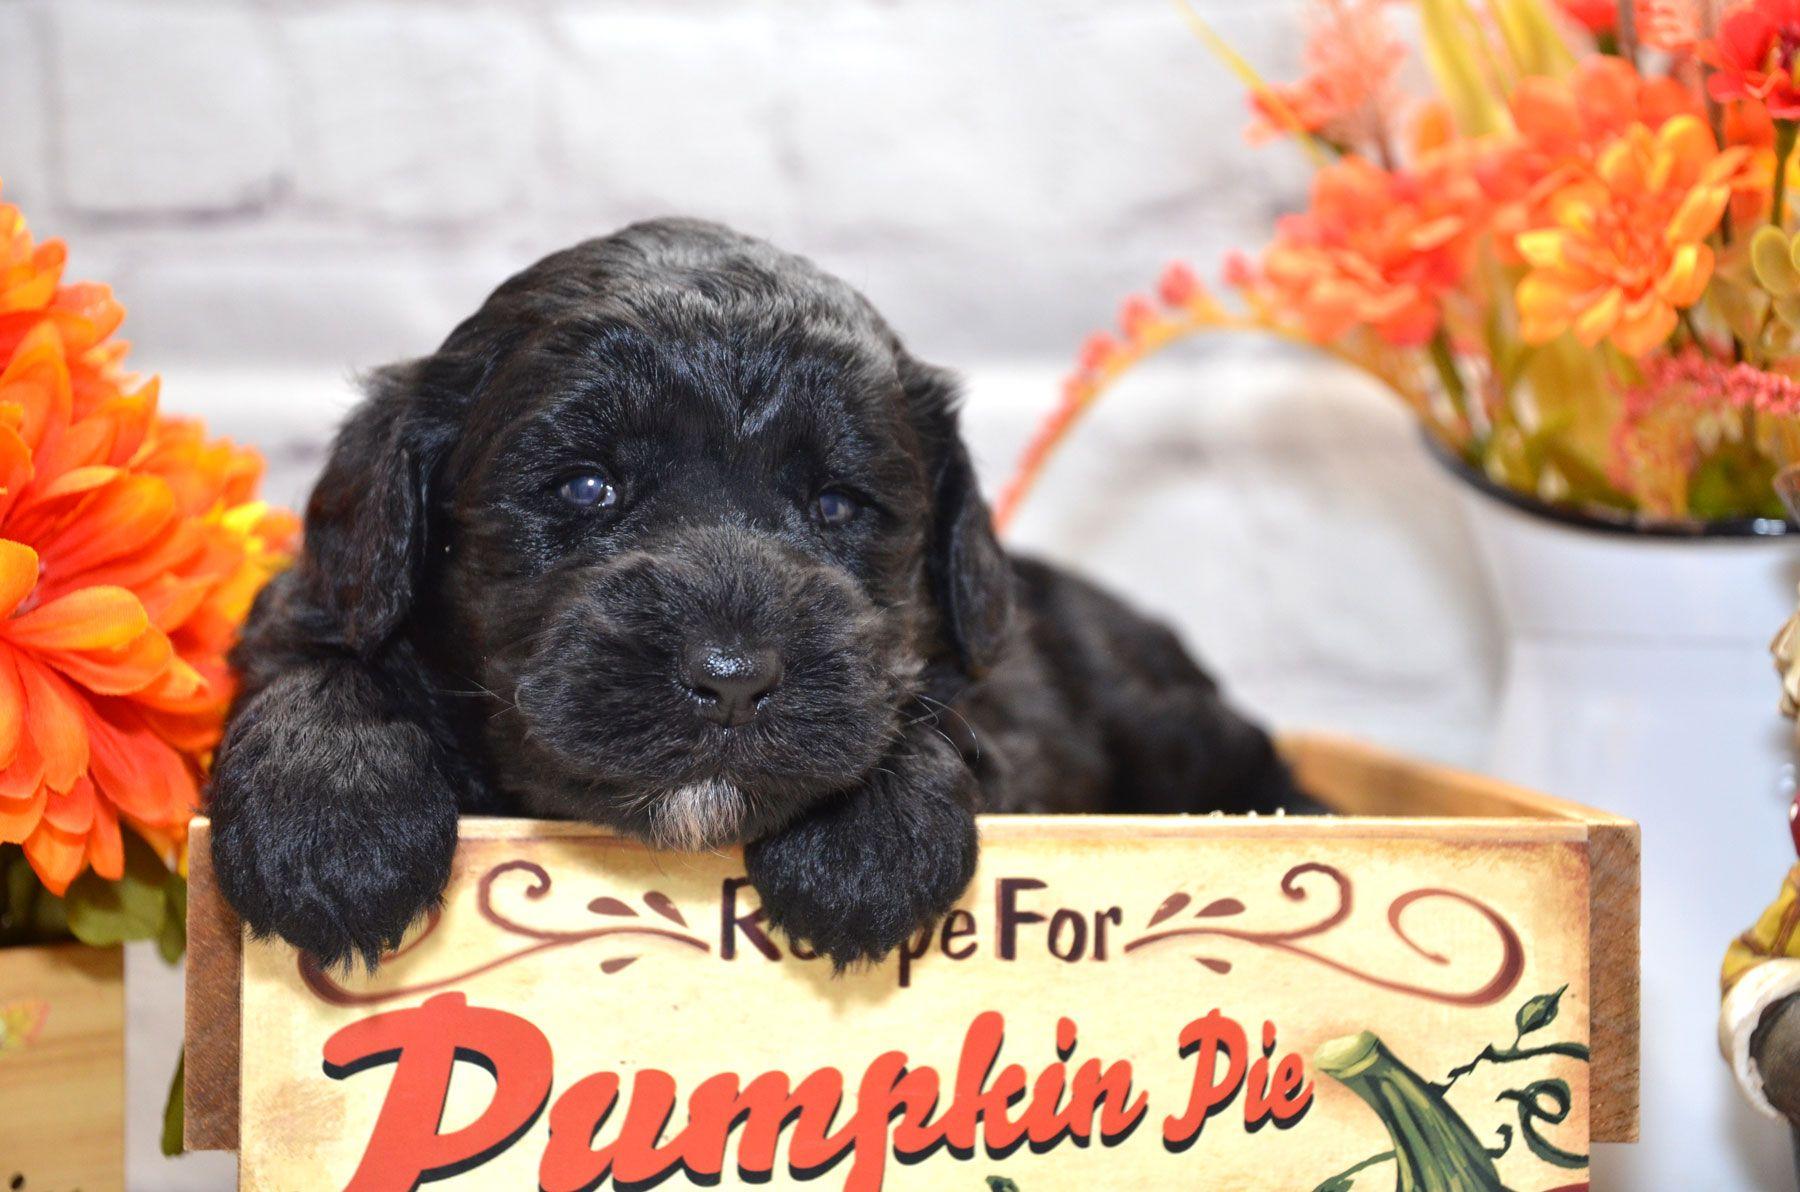 puppies-9-28-20_6658